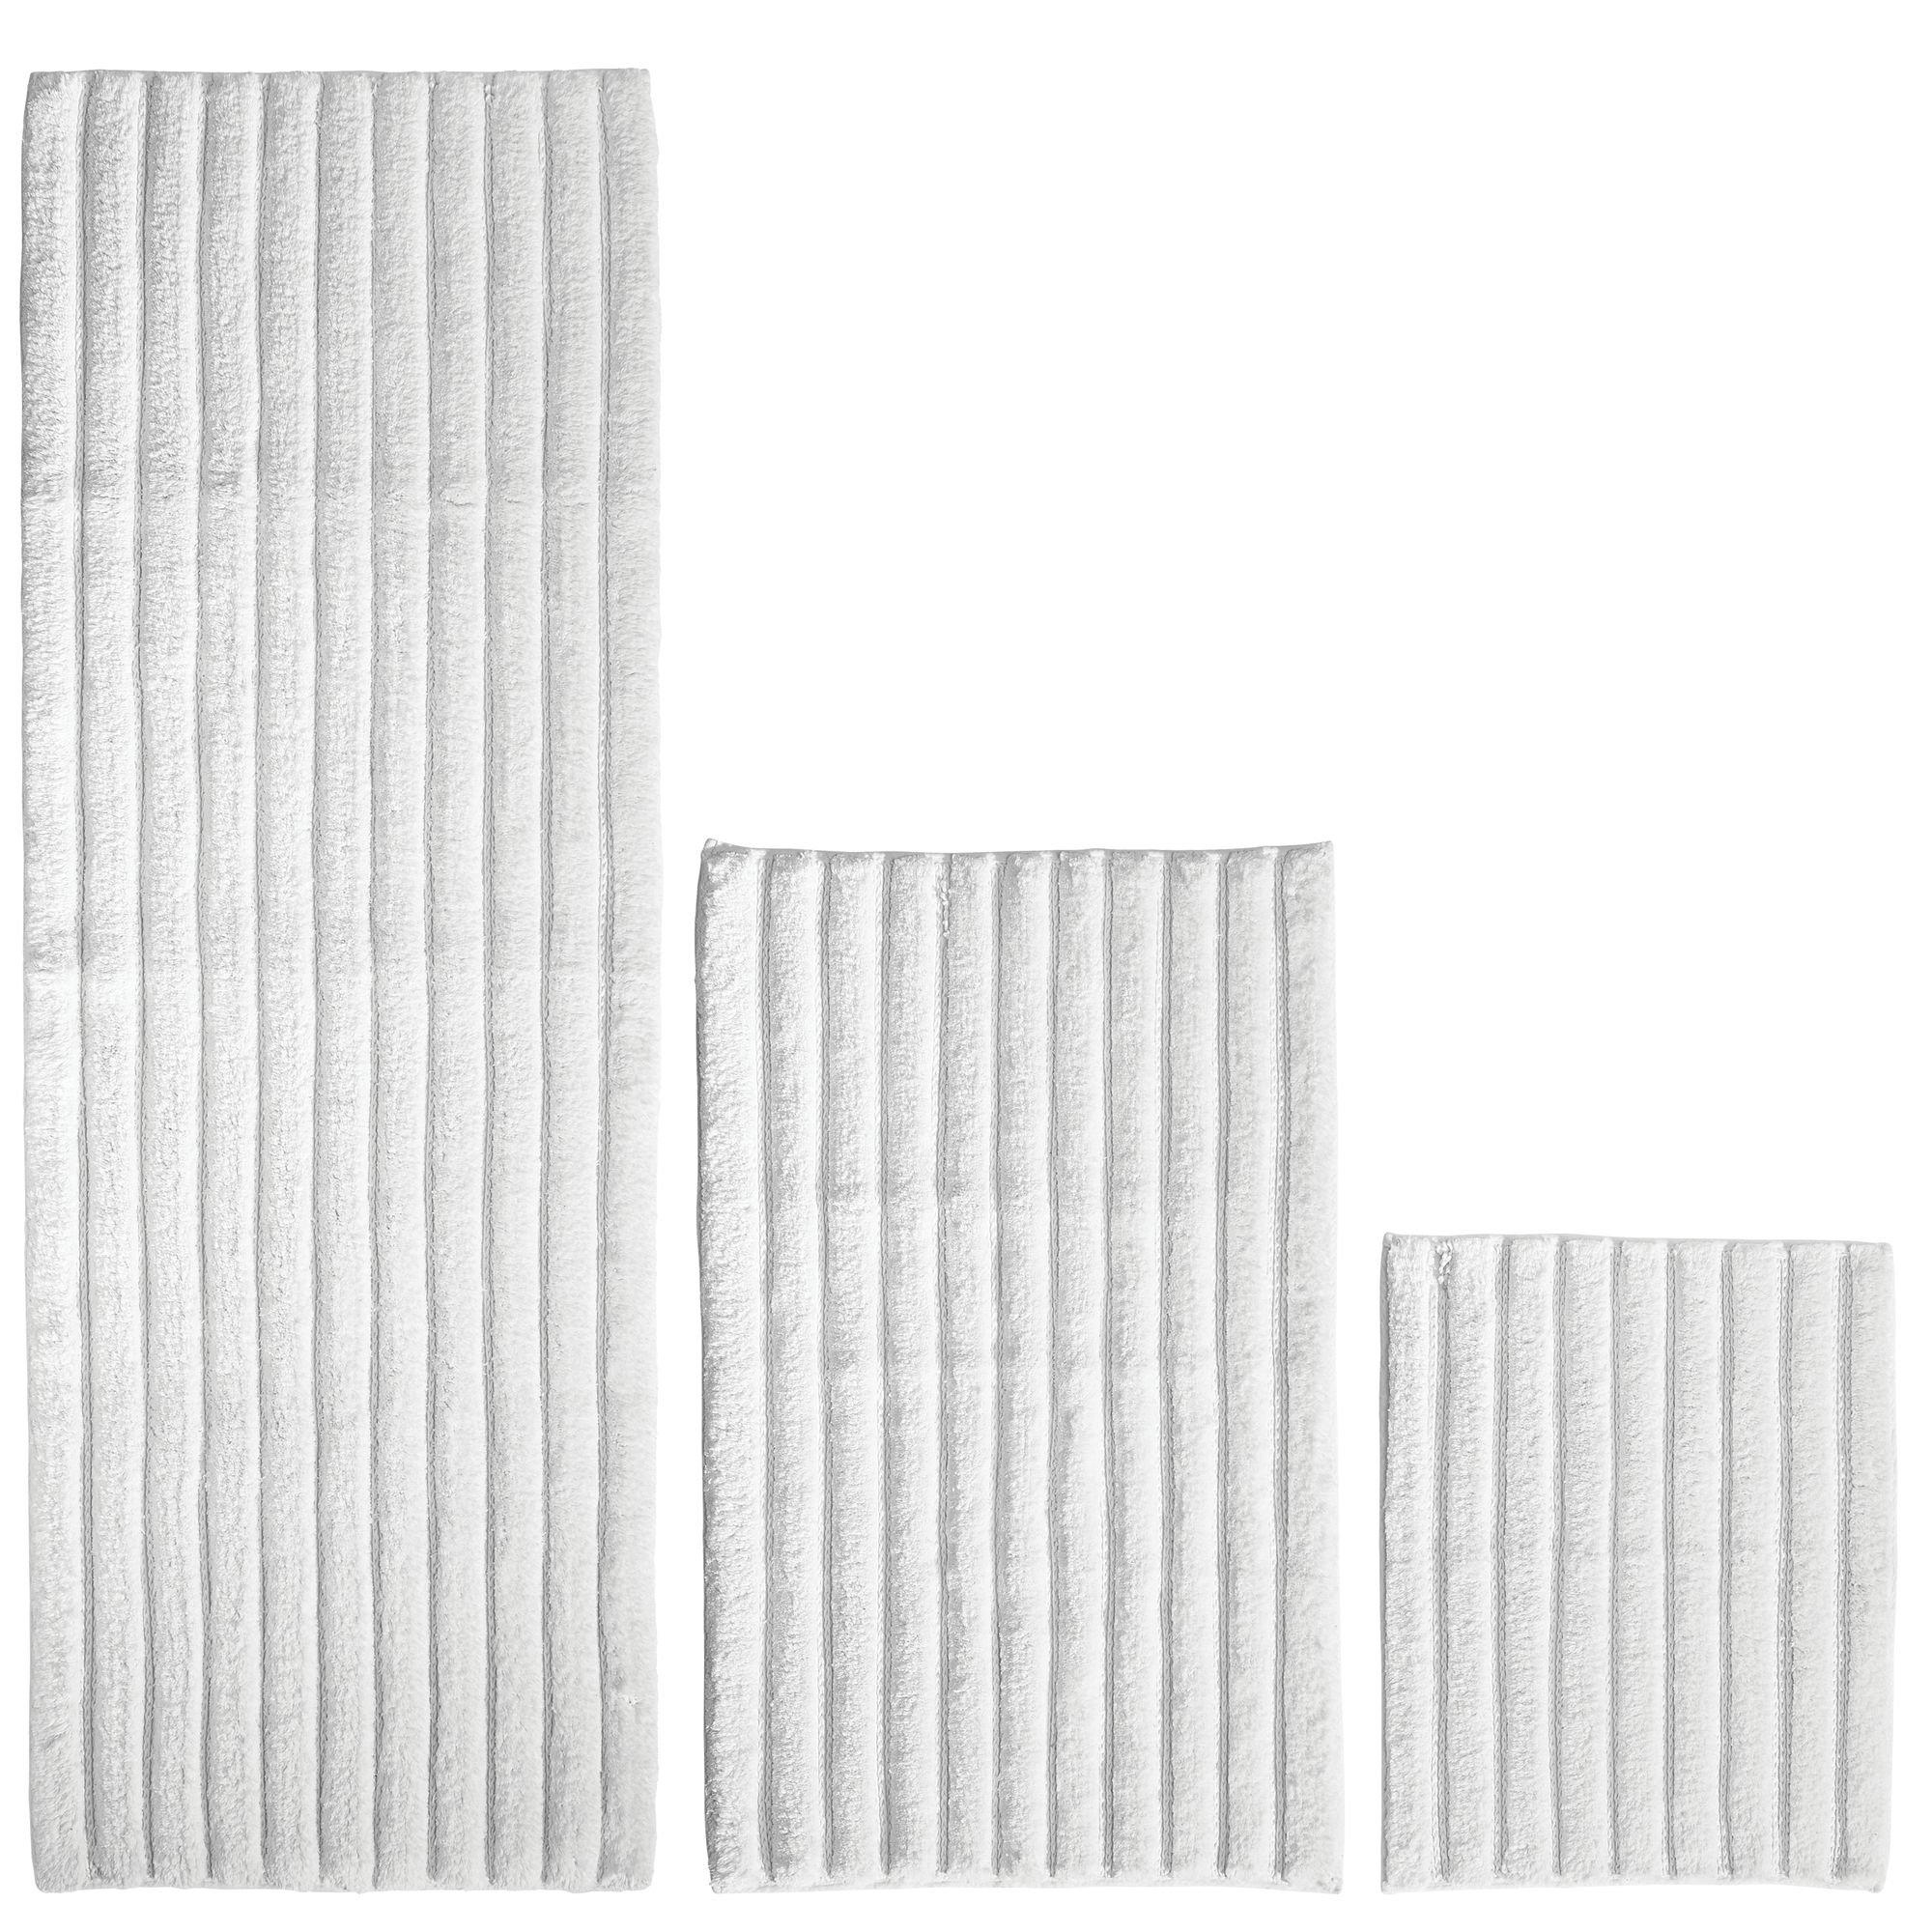 mDesign 100% Cotton Luxury Rectangular Spa Mat Rugs, Plush Water Absorbent - for Bathroom Vanity, Bathtub/Shower, Machine Washable - Ribbed Design - Runner, Standard & Small Rug - Set of 3 - White